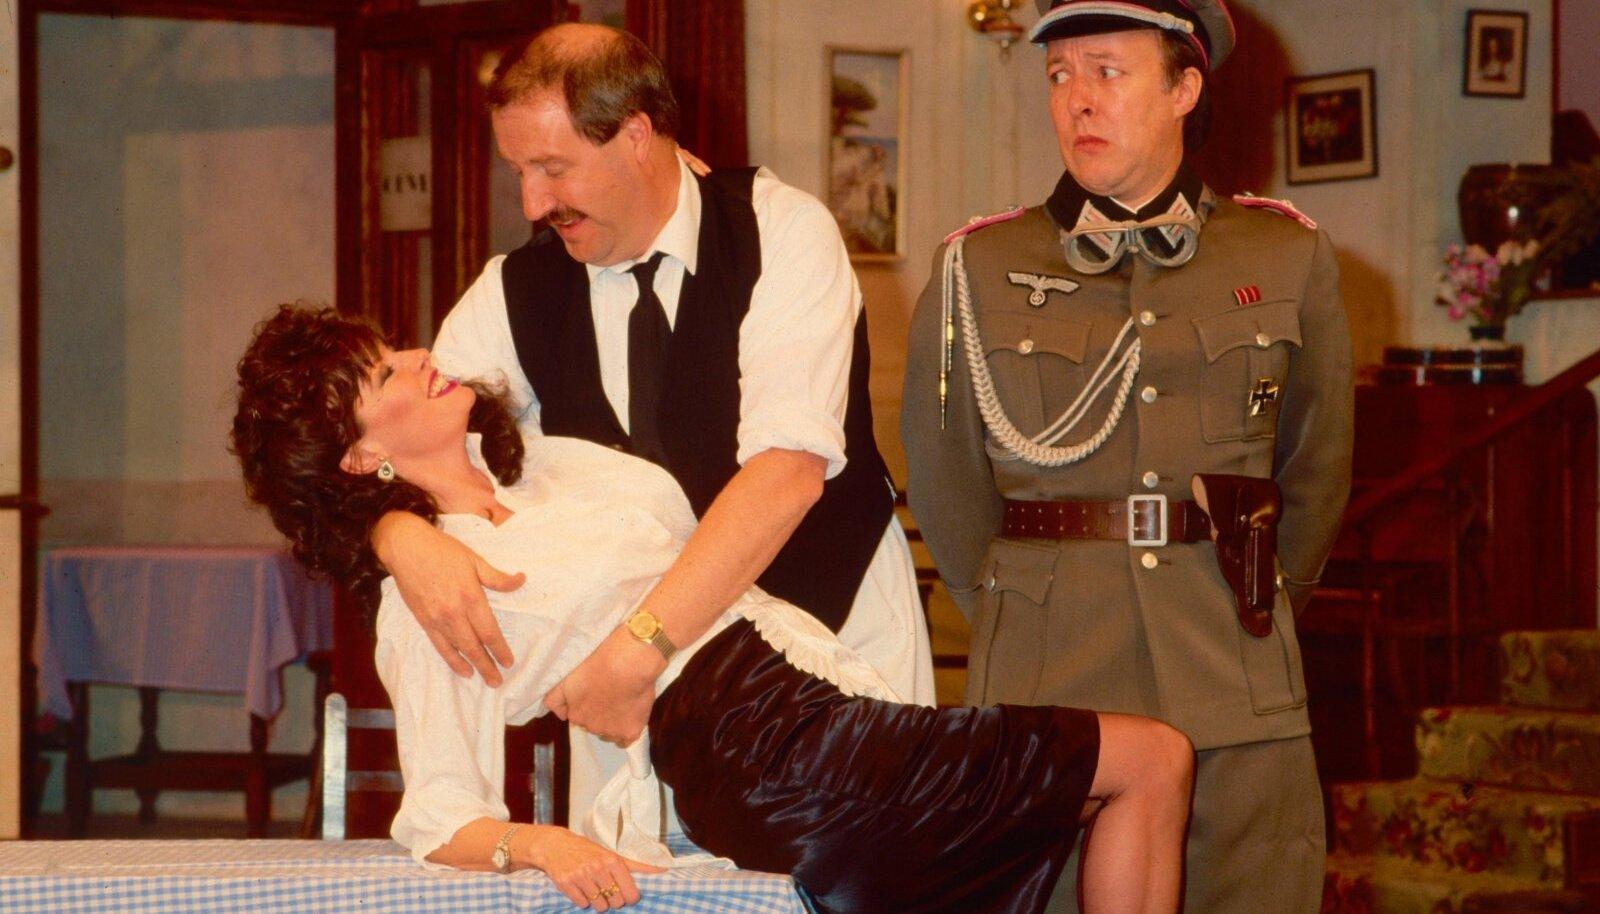 Prantsuse kohvikuomanik René (Gorden Kaye, keskel), tema armuke, ettekandja Yvette (Vicki Michelle) ja saksa leitnant Hubert Gruber (Guy Siner) 1980-ndate keskel